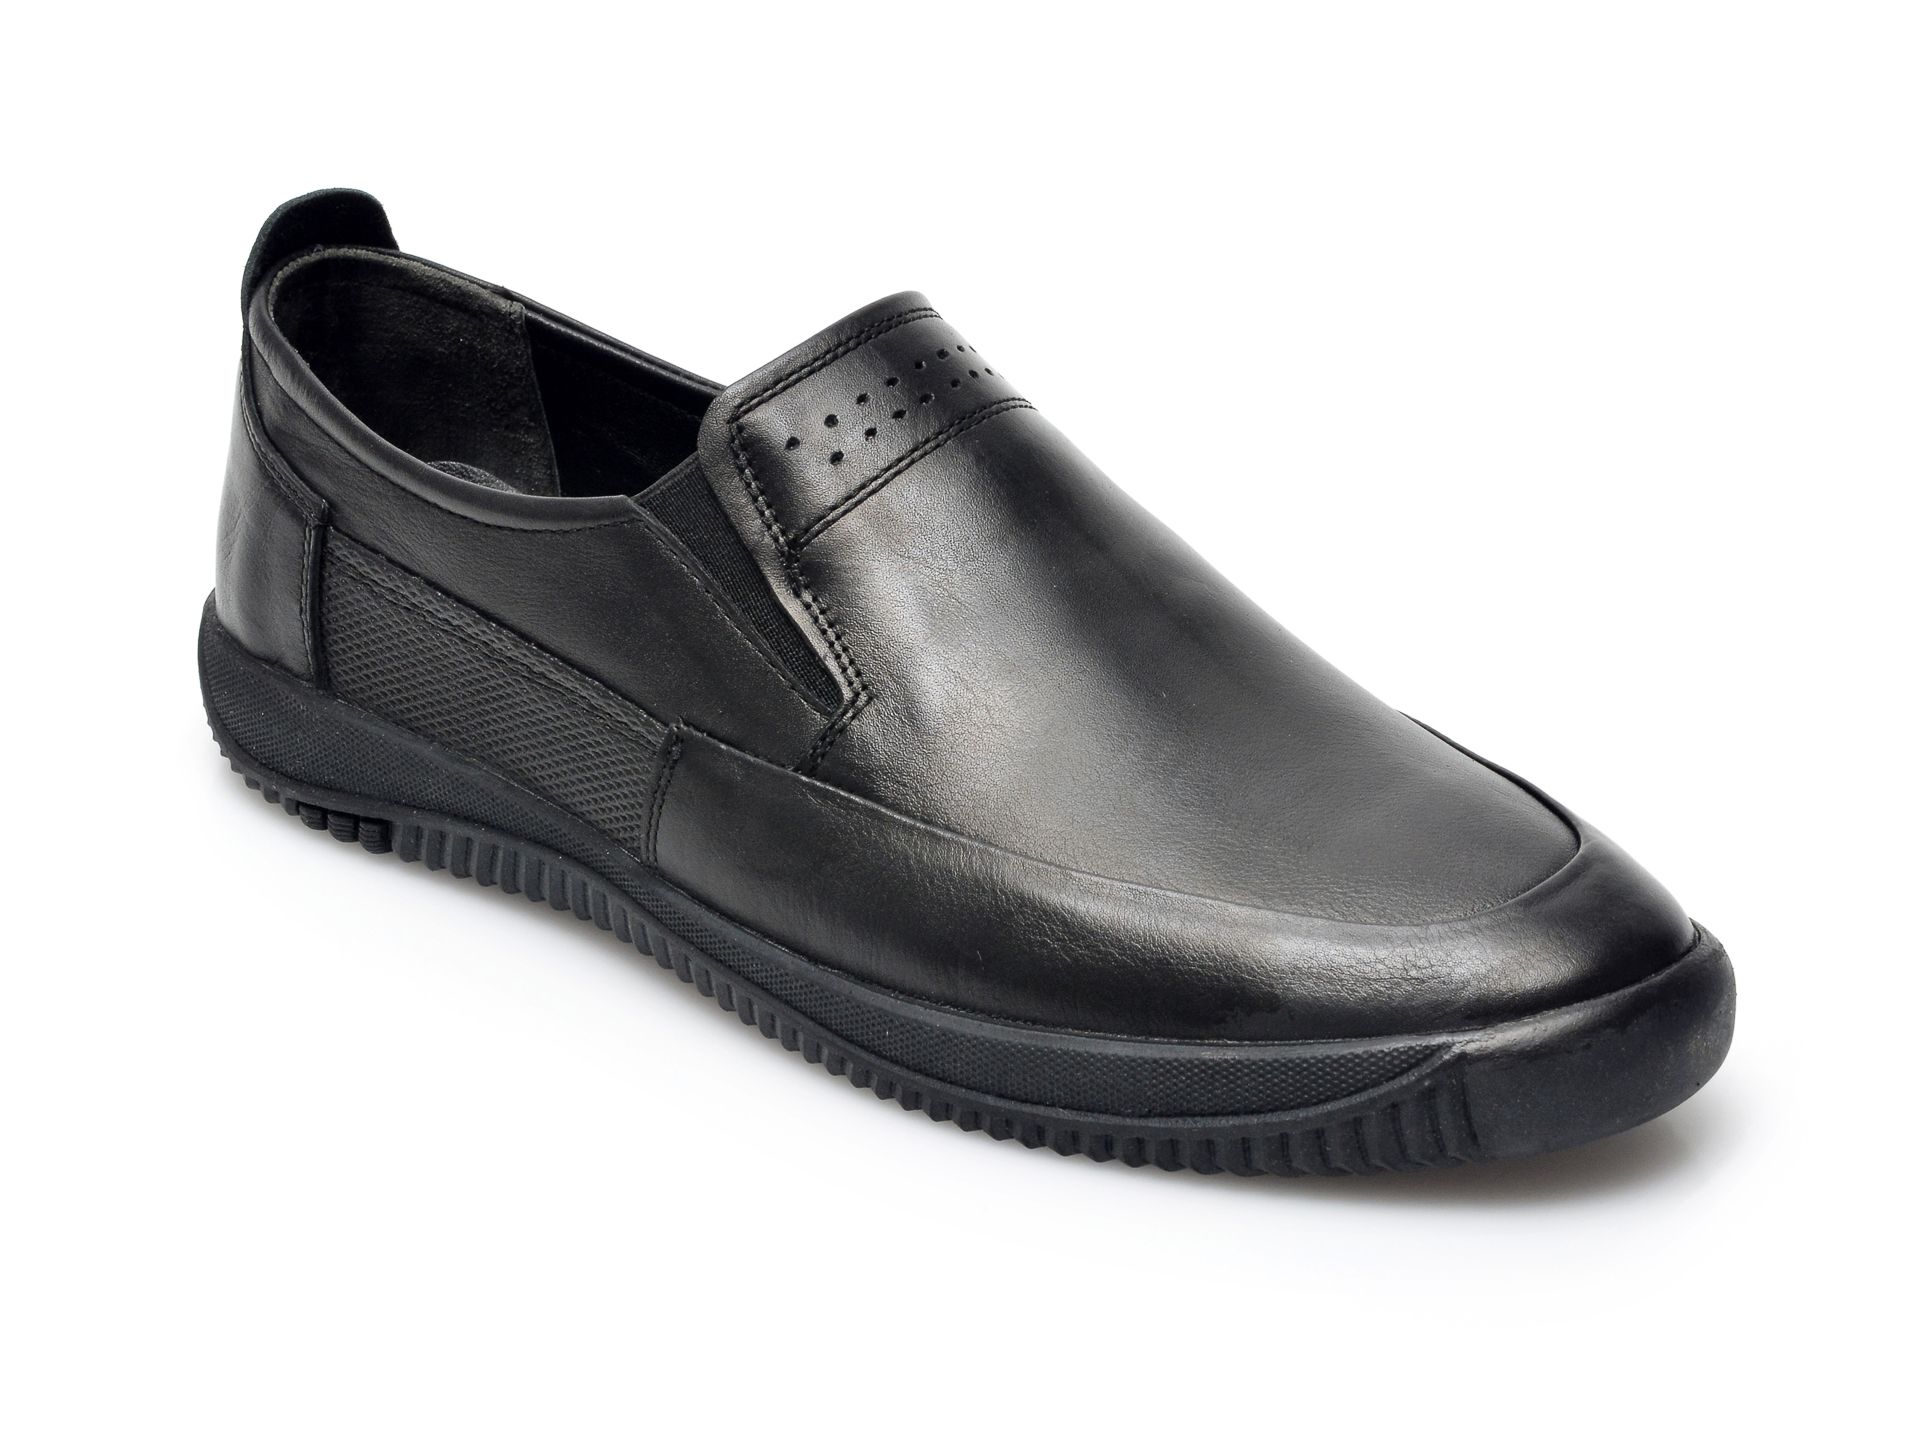 Pantofi OTTER negri, M5540, din piele naturala